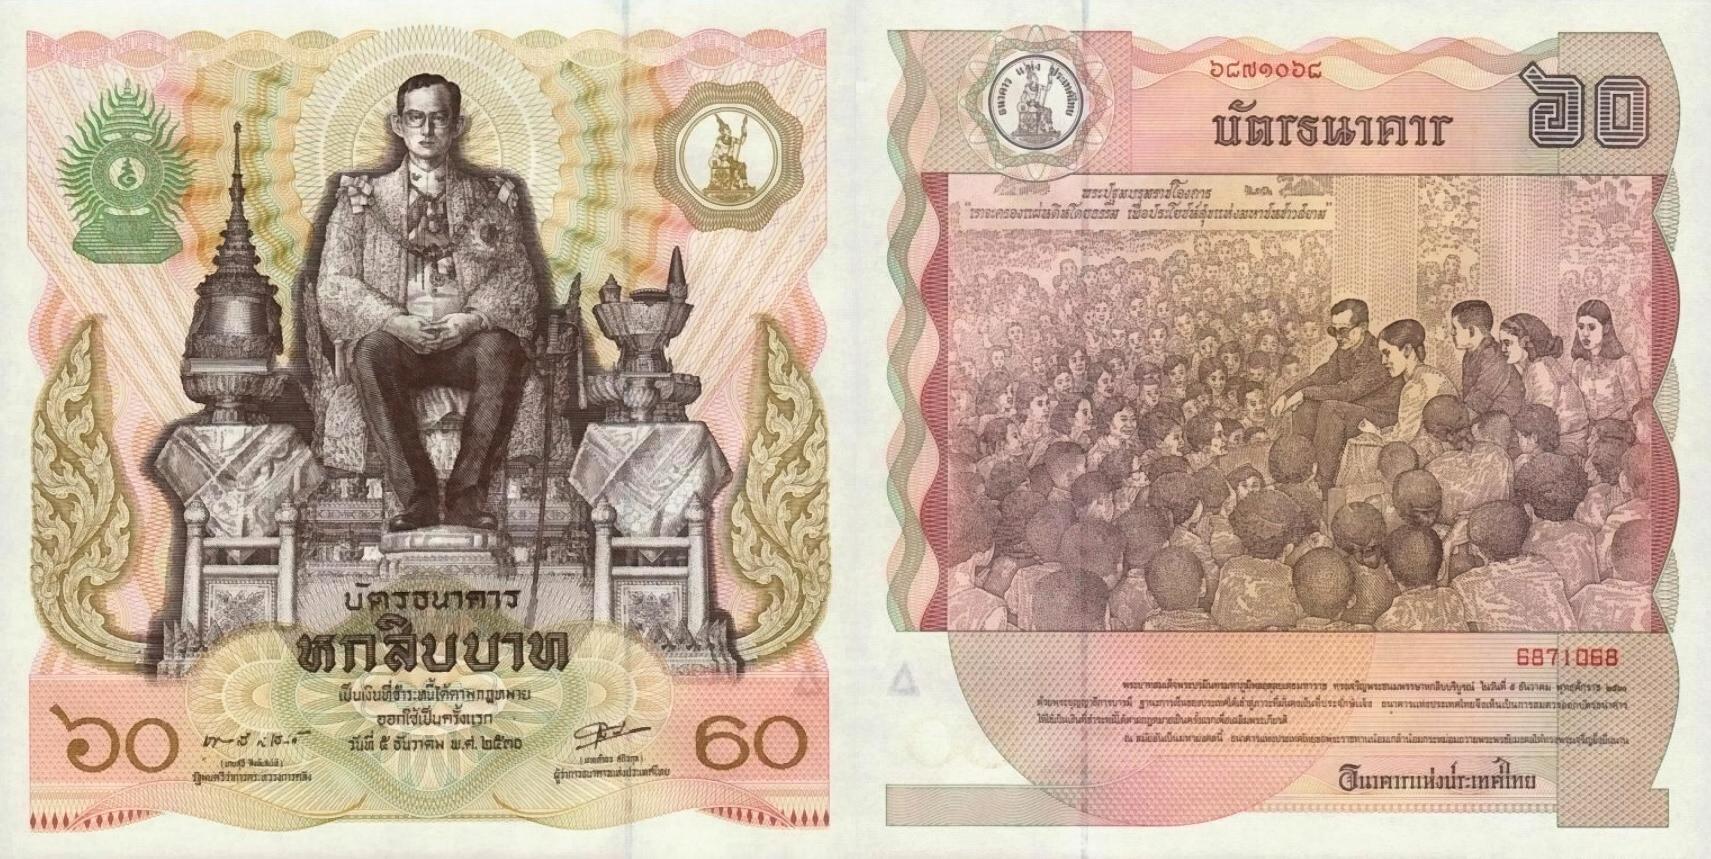 # ТАИЛАНД - 60 бат - 1987 P93 UNC 15.9x15.9 см